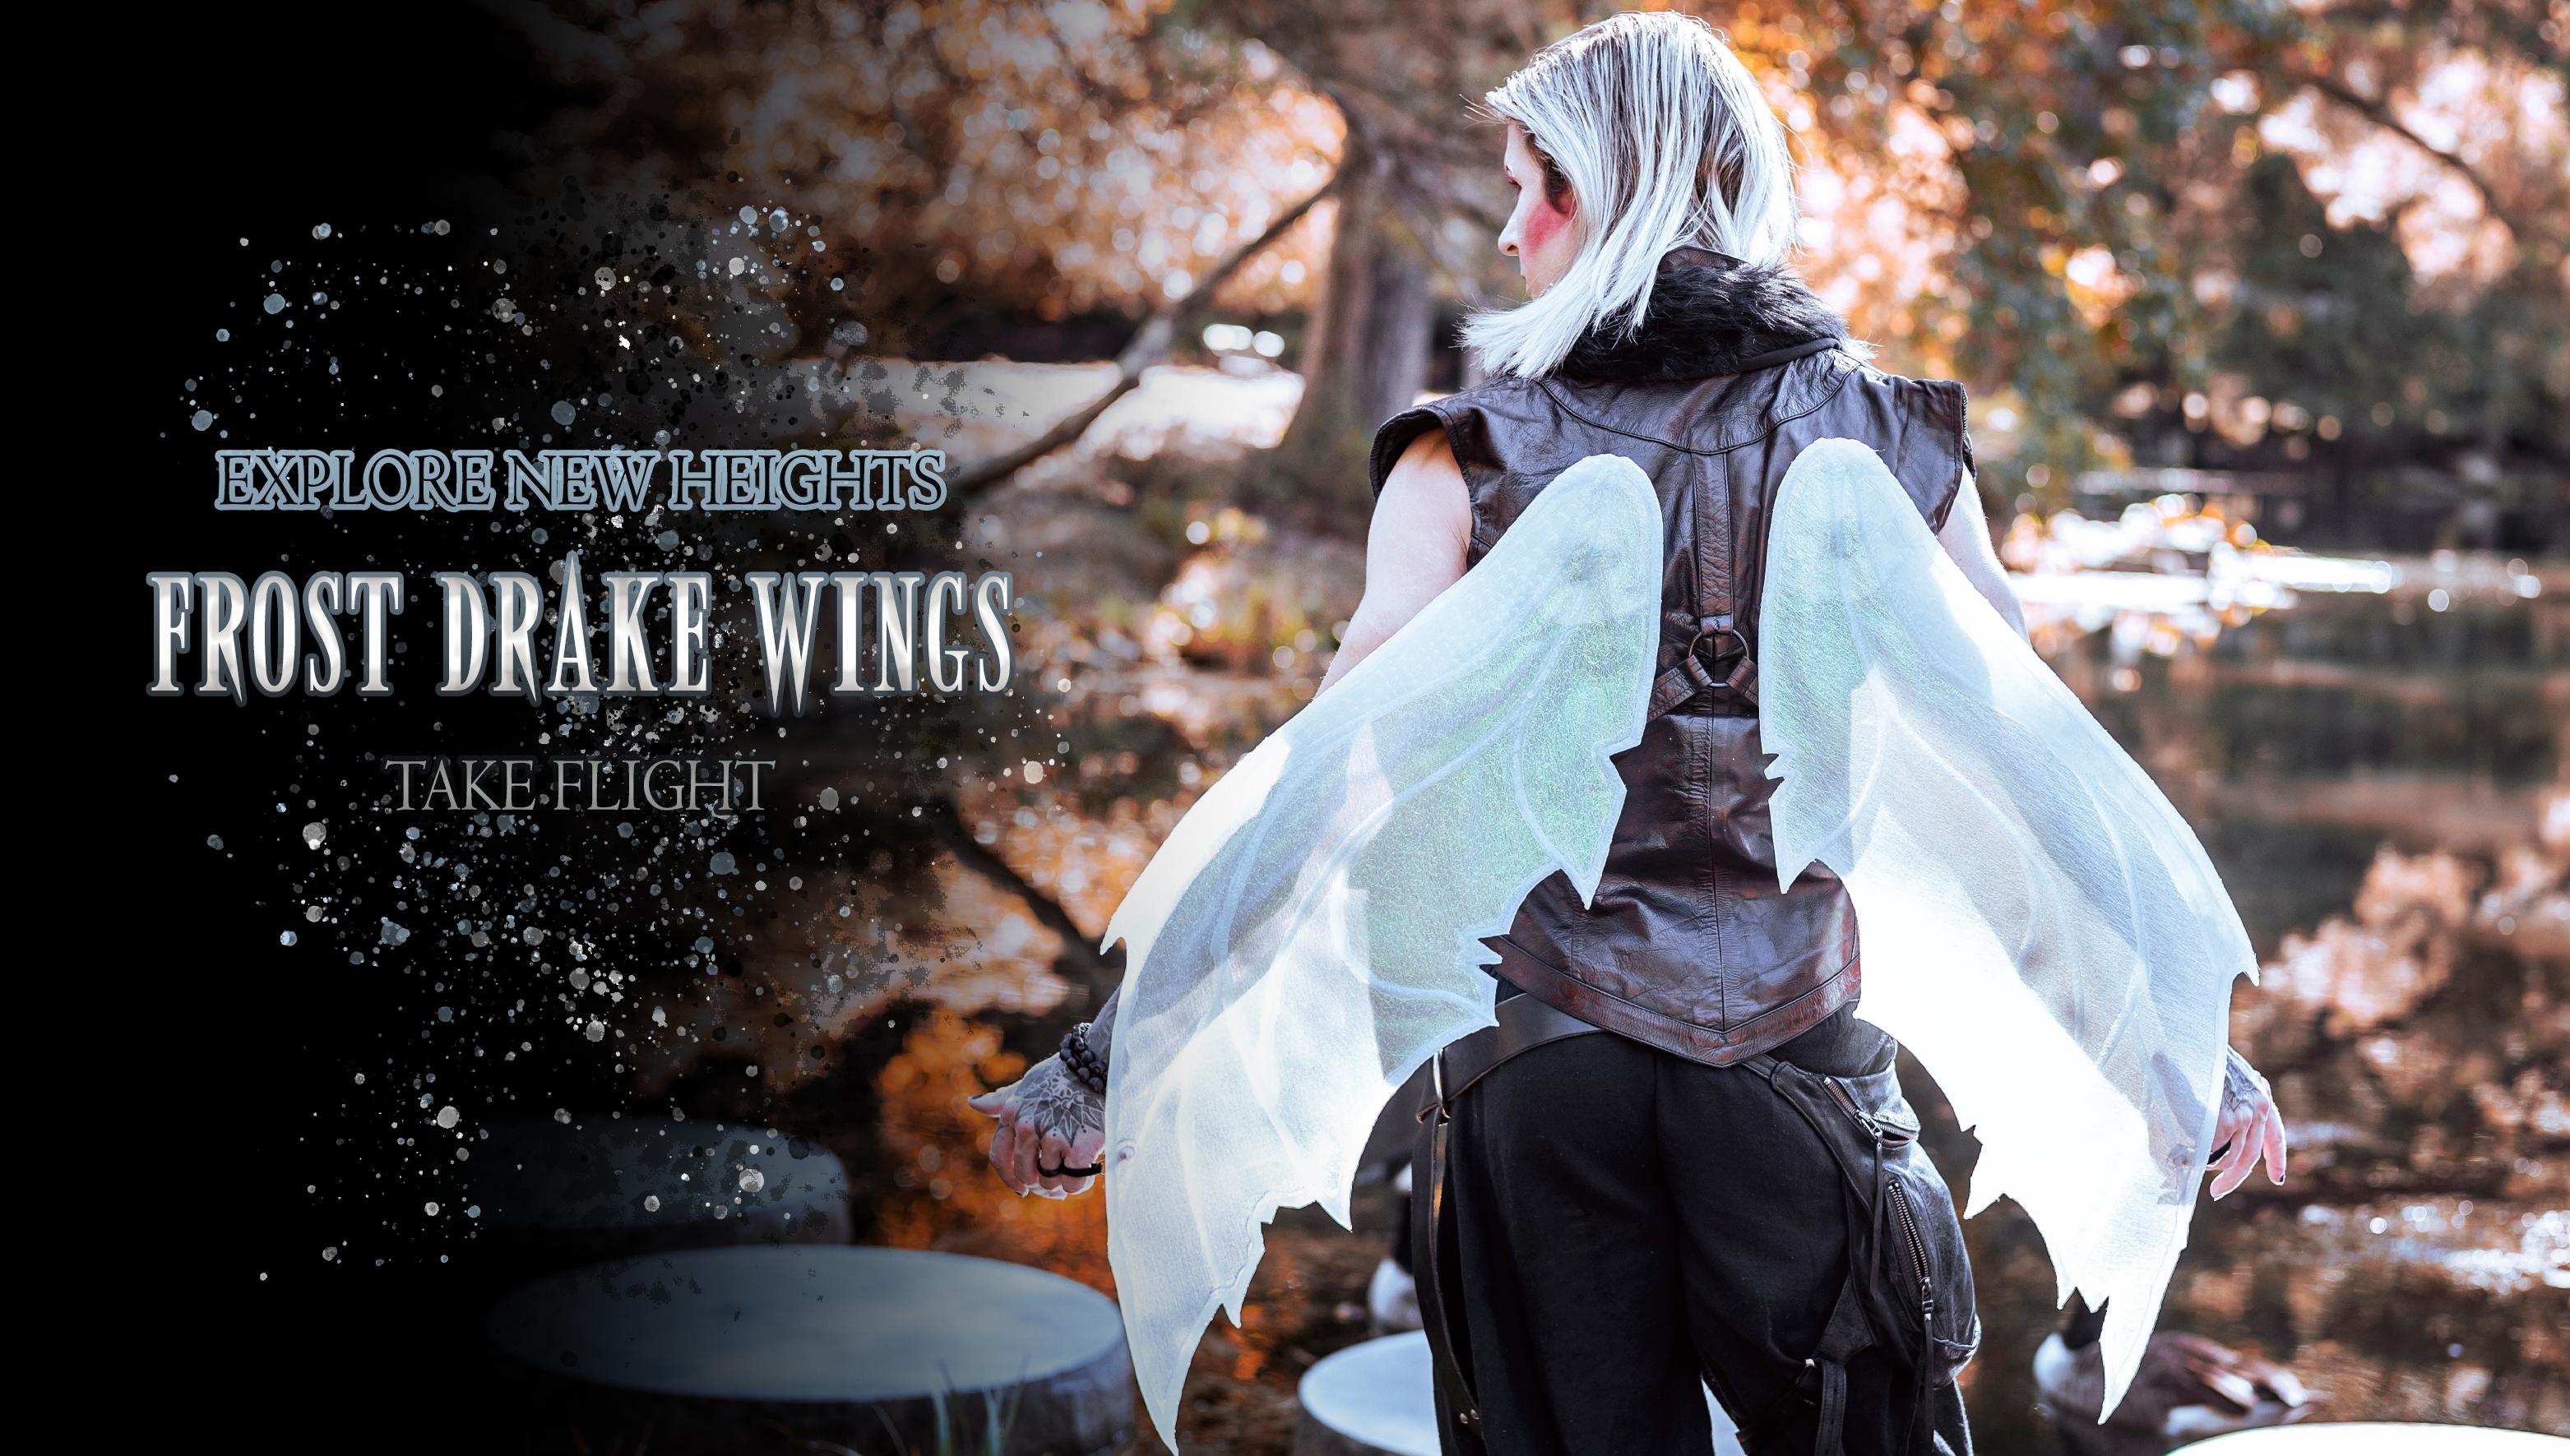 Verillas Frost Drake Wings Glow in the Dark